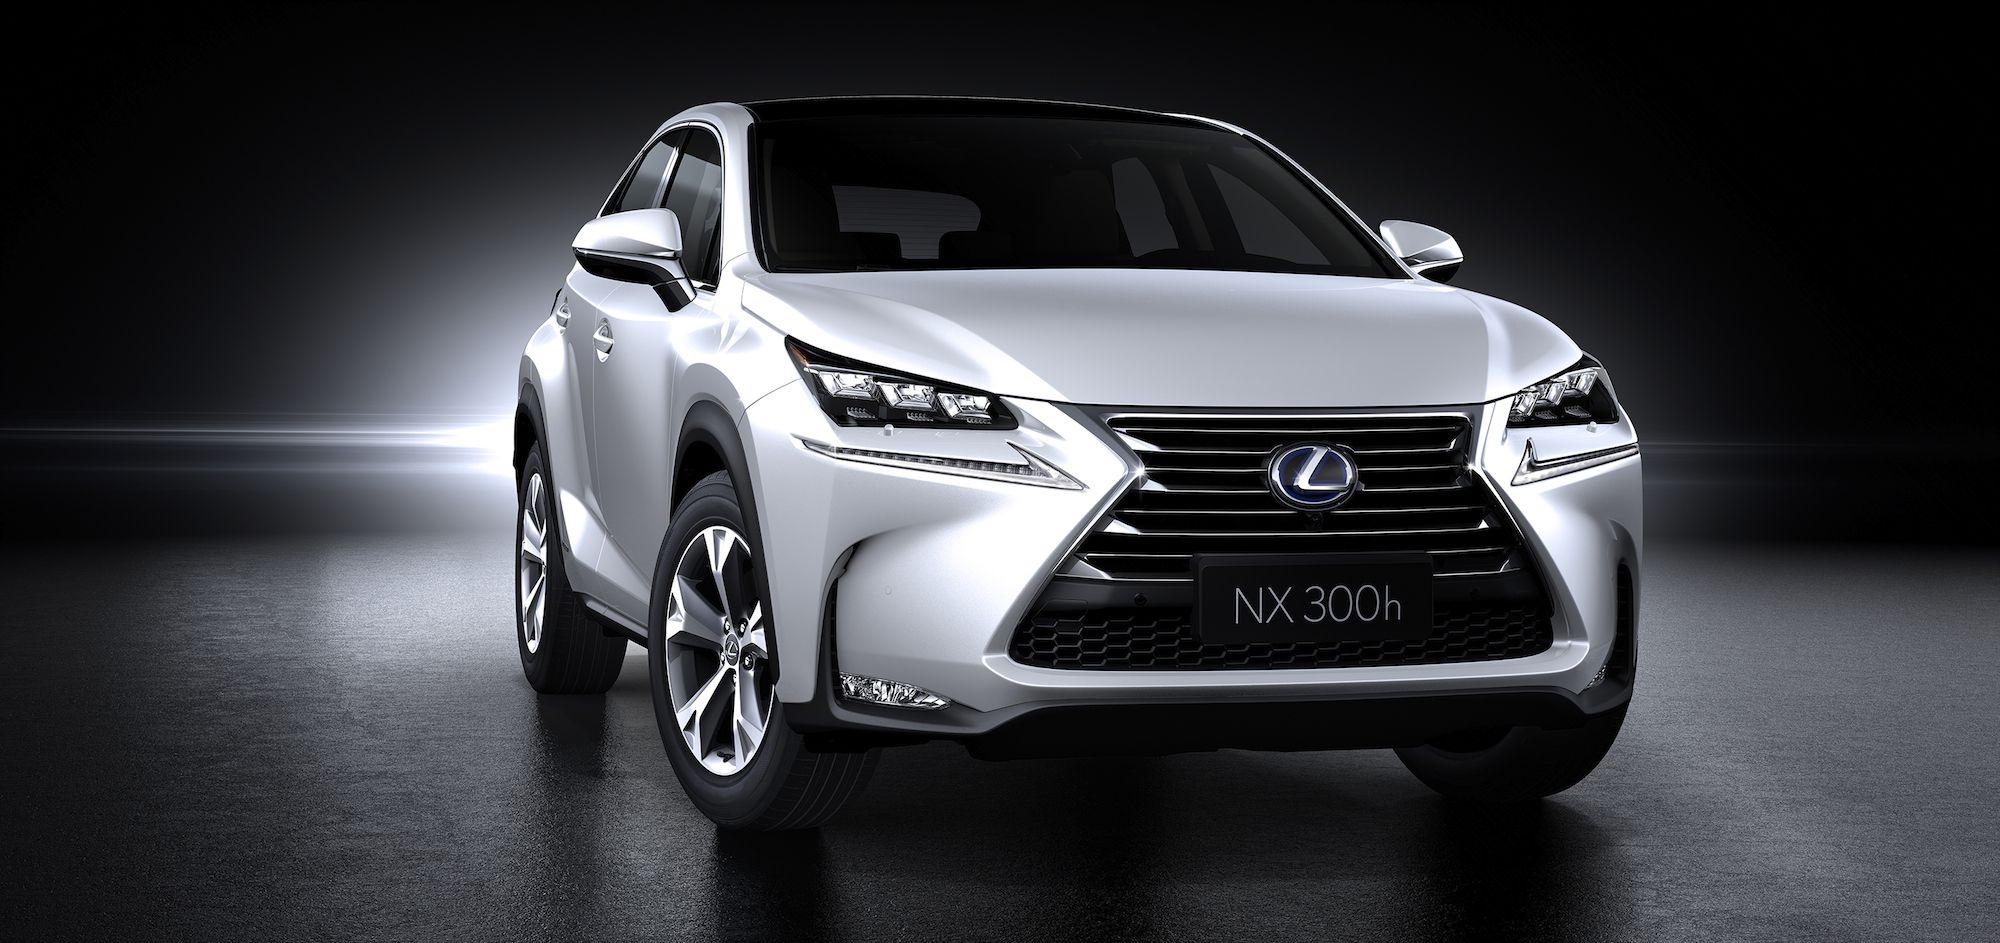 Lexus nx 200h hybrid crossover